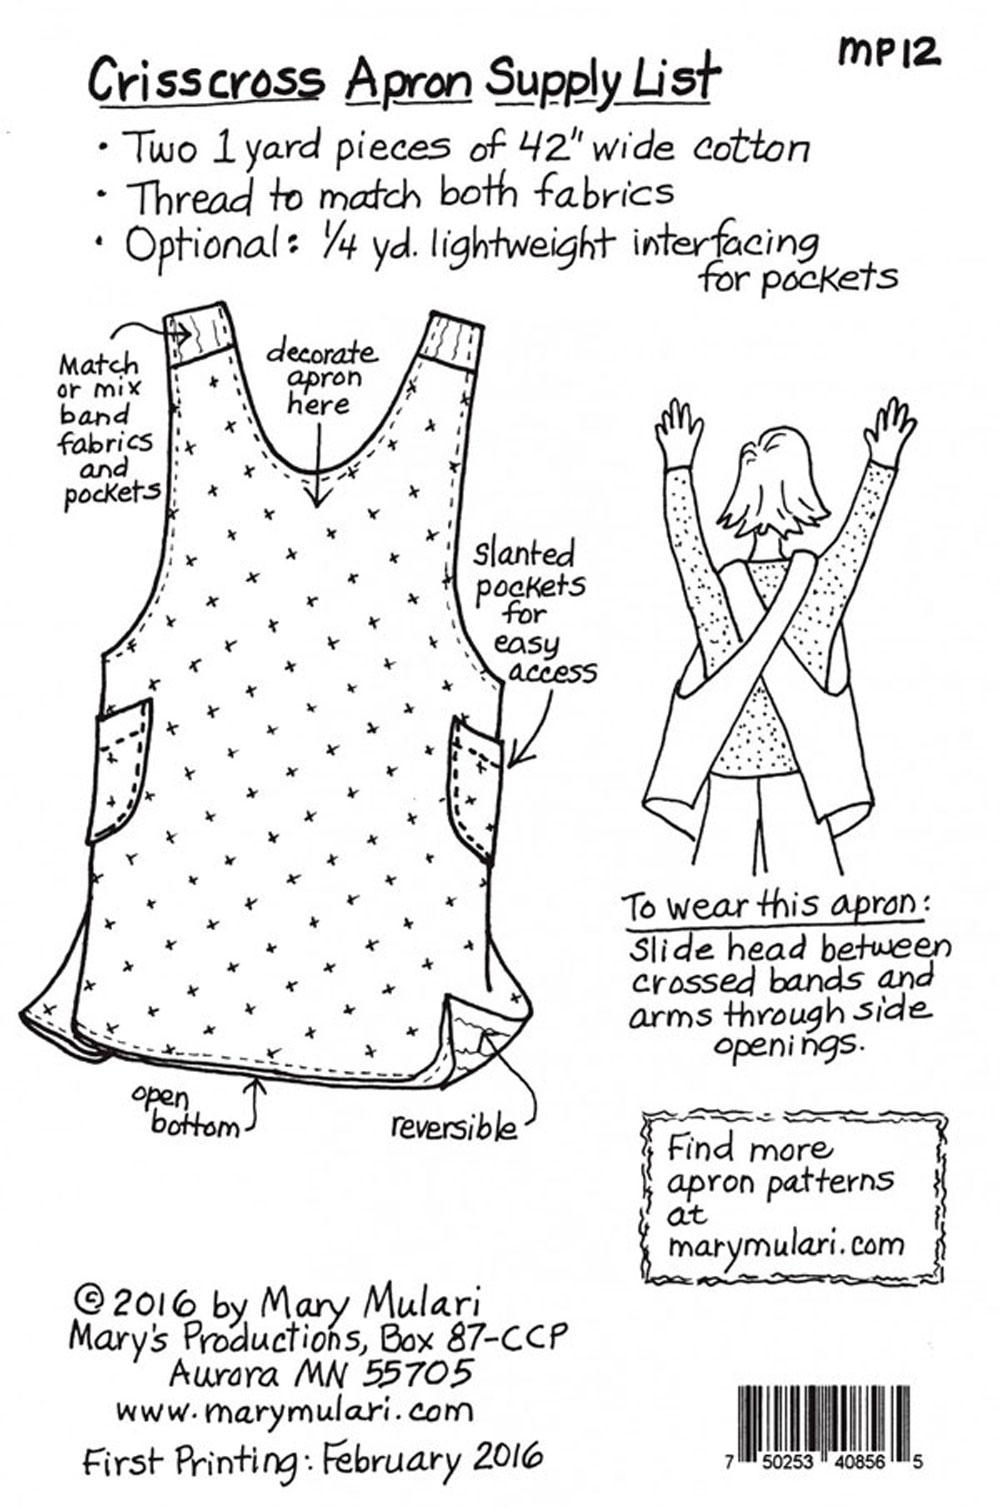 Crisscross Apron Sewing Pattern From Mary Mulari Designs